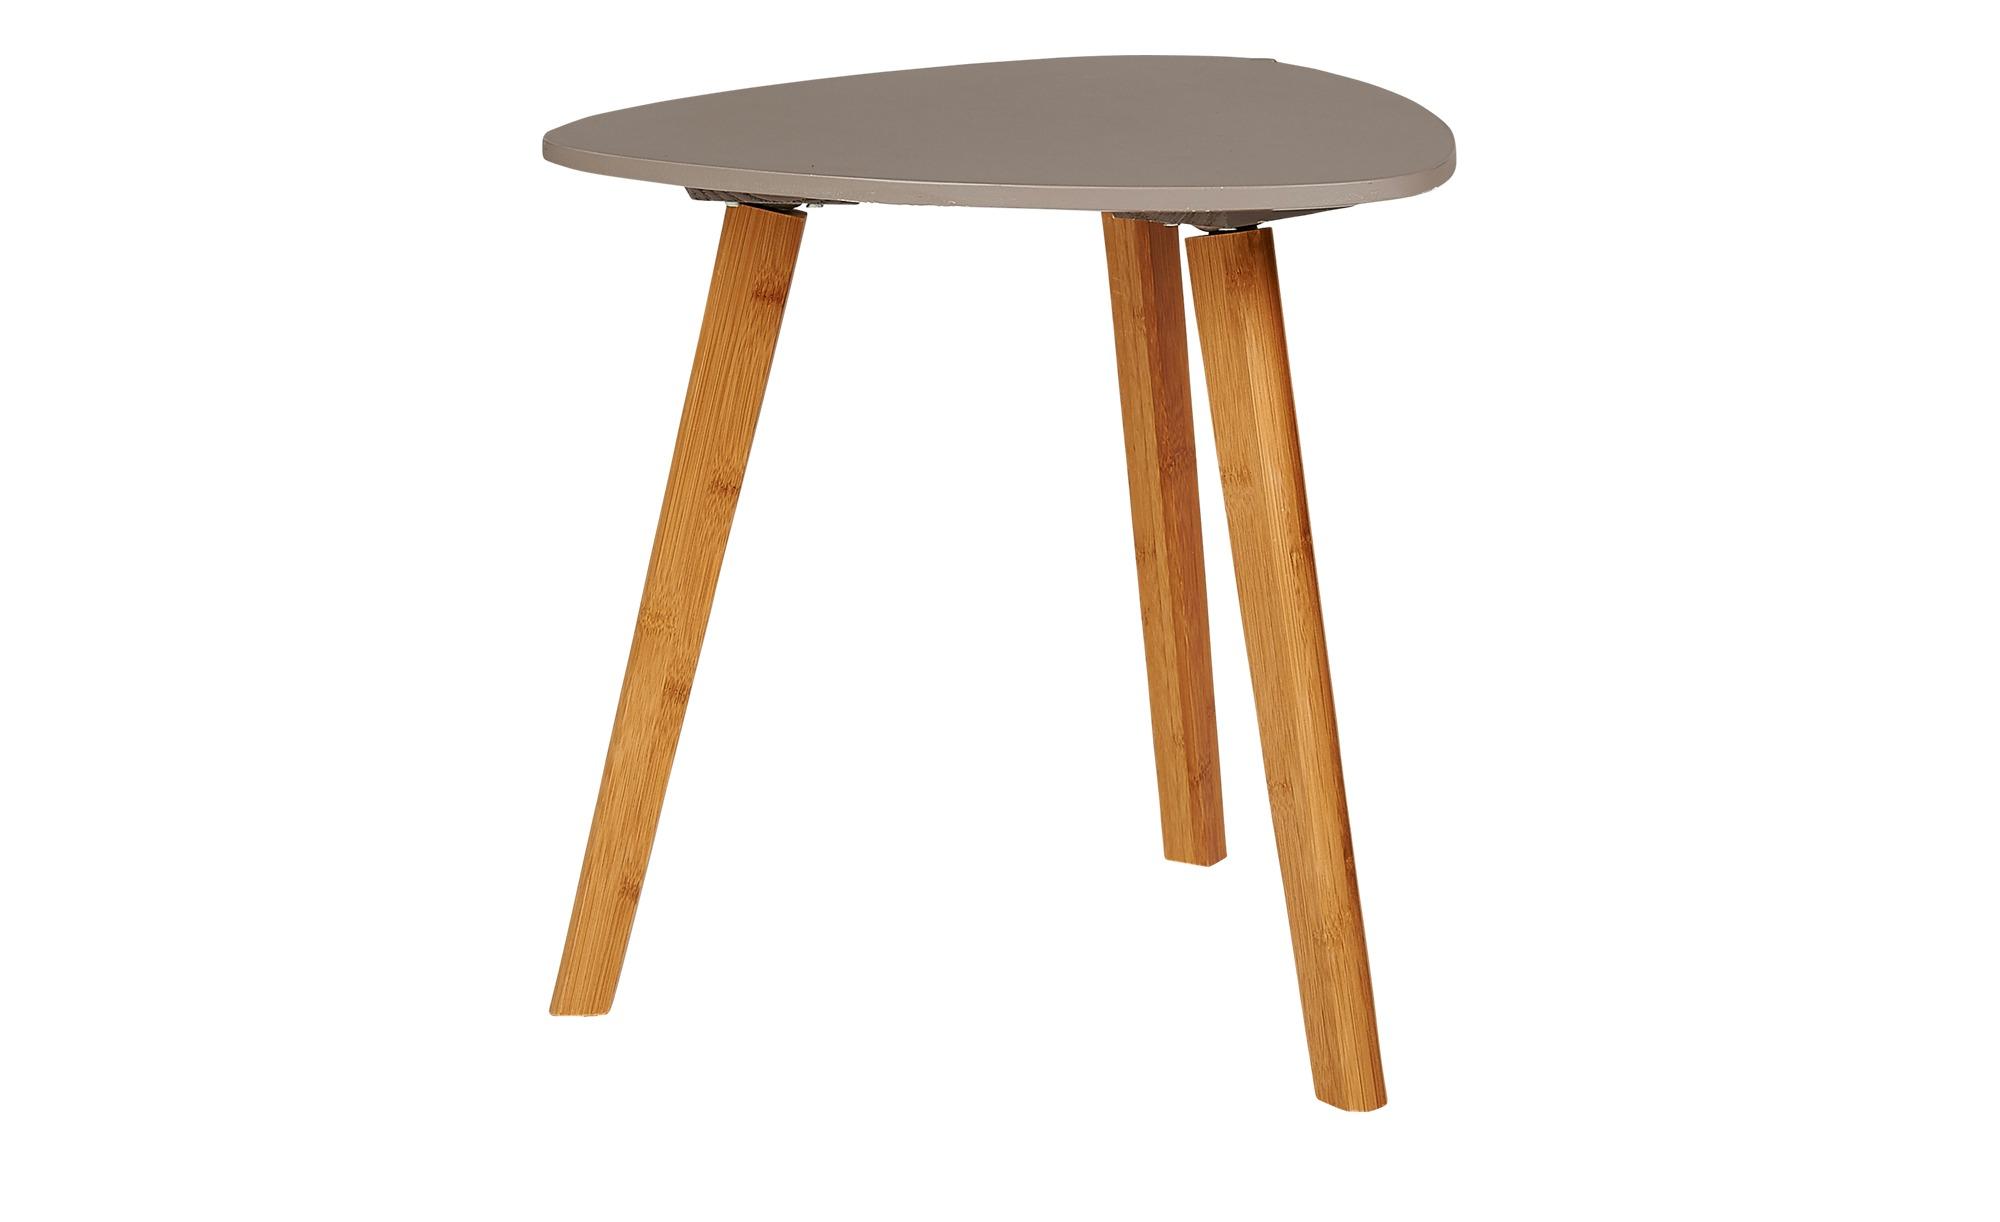 Beistelltisch  Bamboo ¦ grau ¦ Maße (cm): B: 40 H: 40 Tische > Beistelltische > Beistelltische ohne Rollen - Höffner